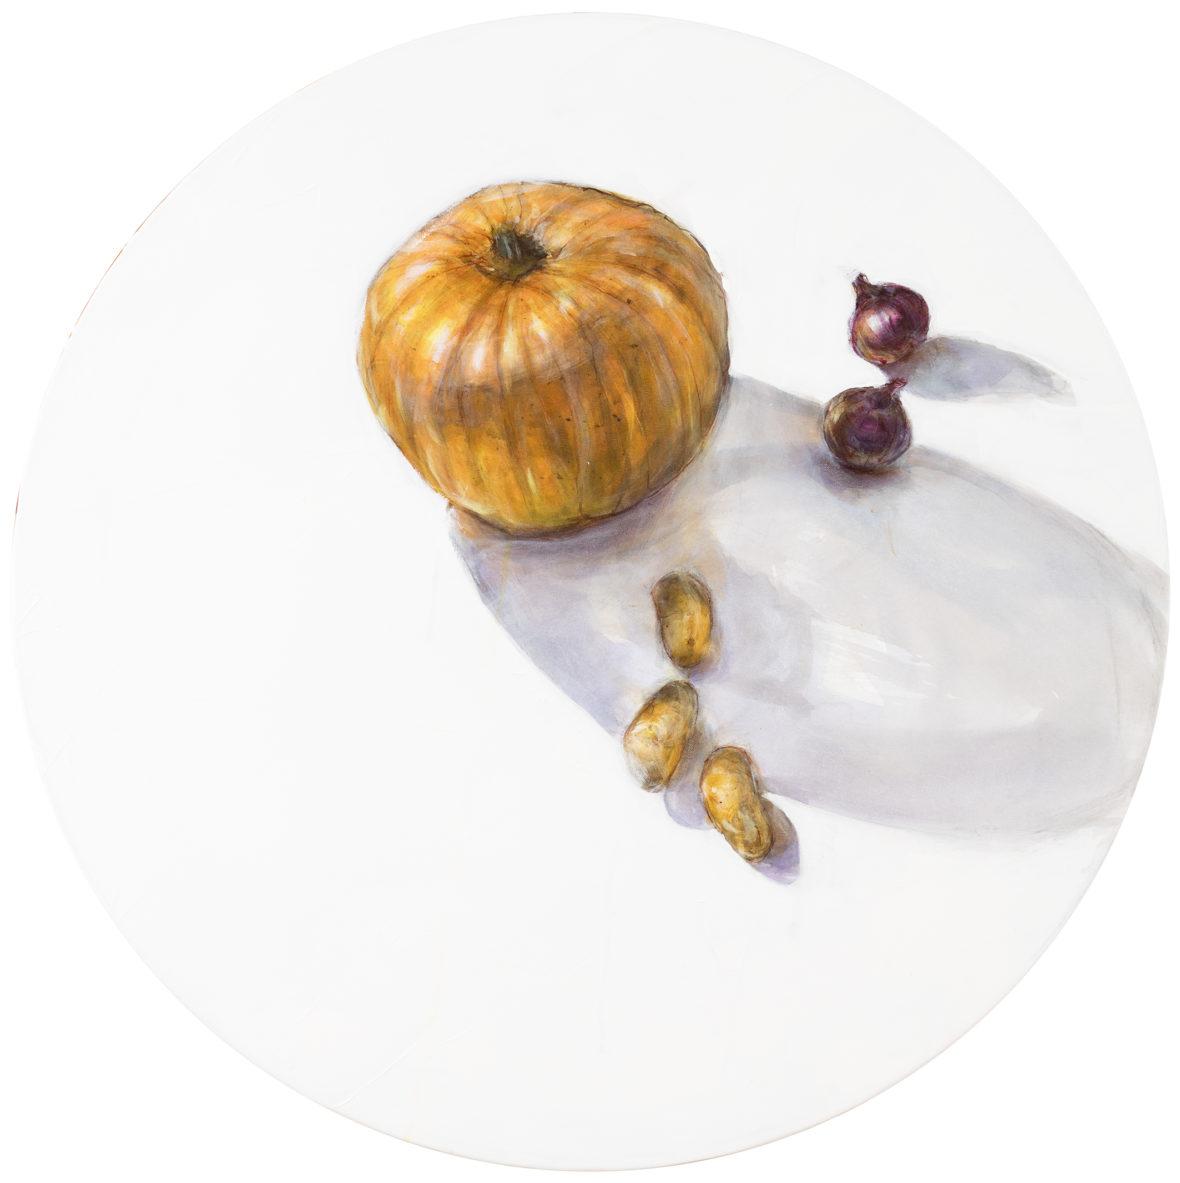 Soppa-ainekset / Ingredients of Soup